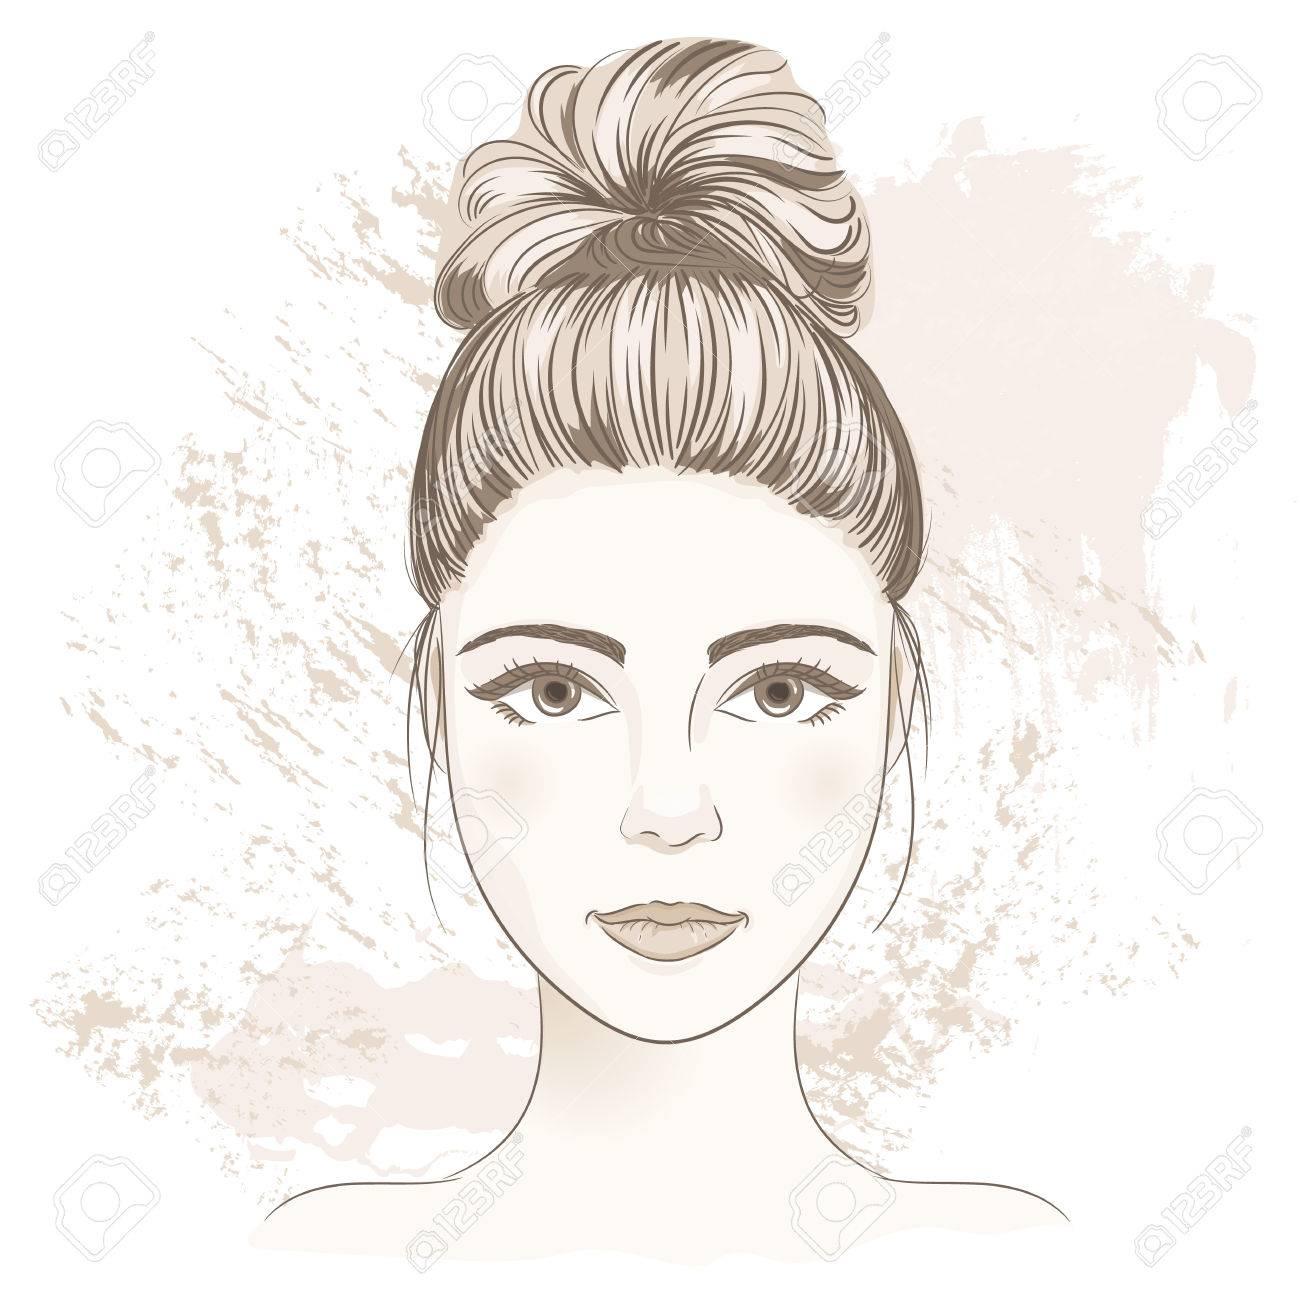 1300x1300 Young Woman Face. Digital Monochrome Sketch Portrait Of Beautiful